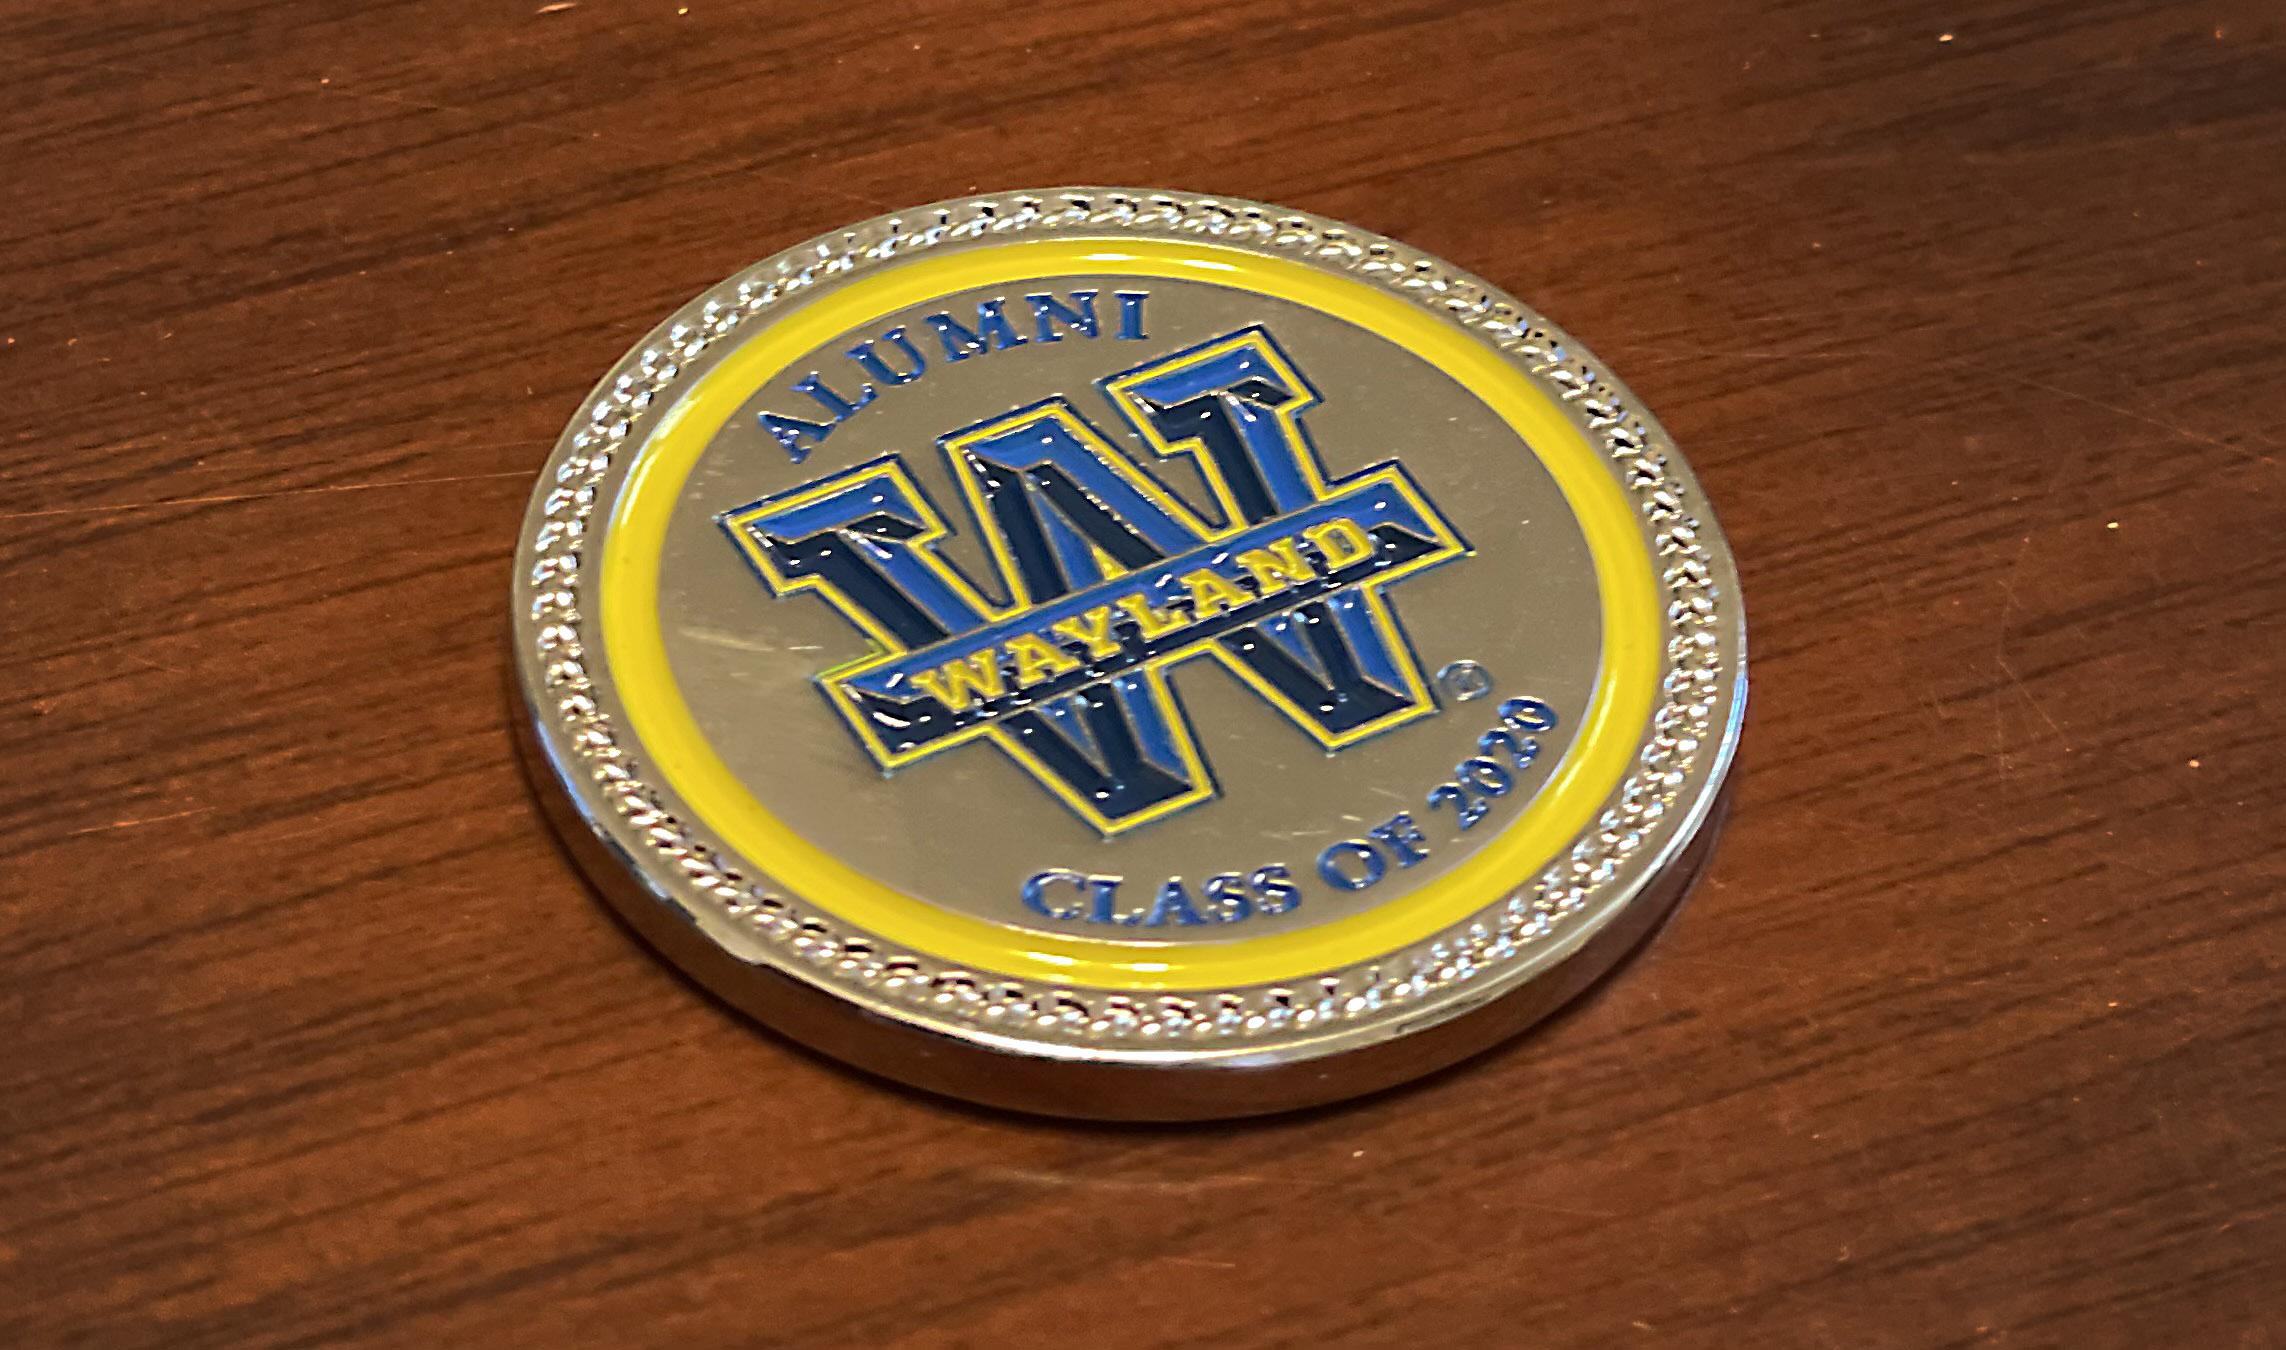 Wayland's First Challenge Coin